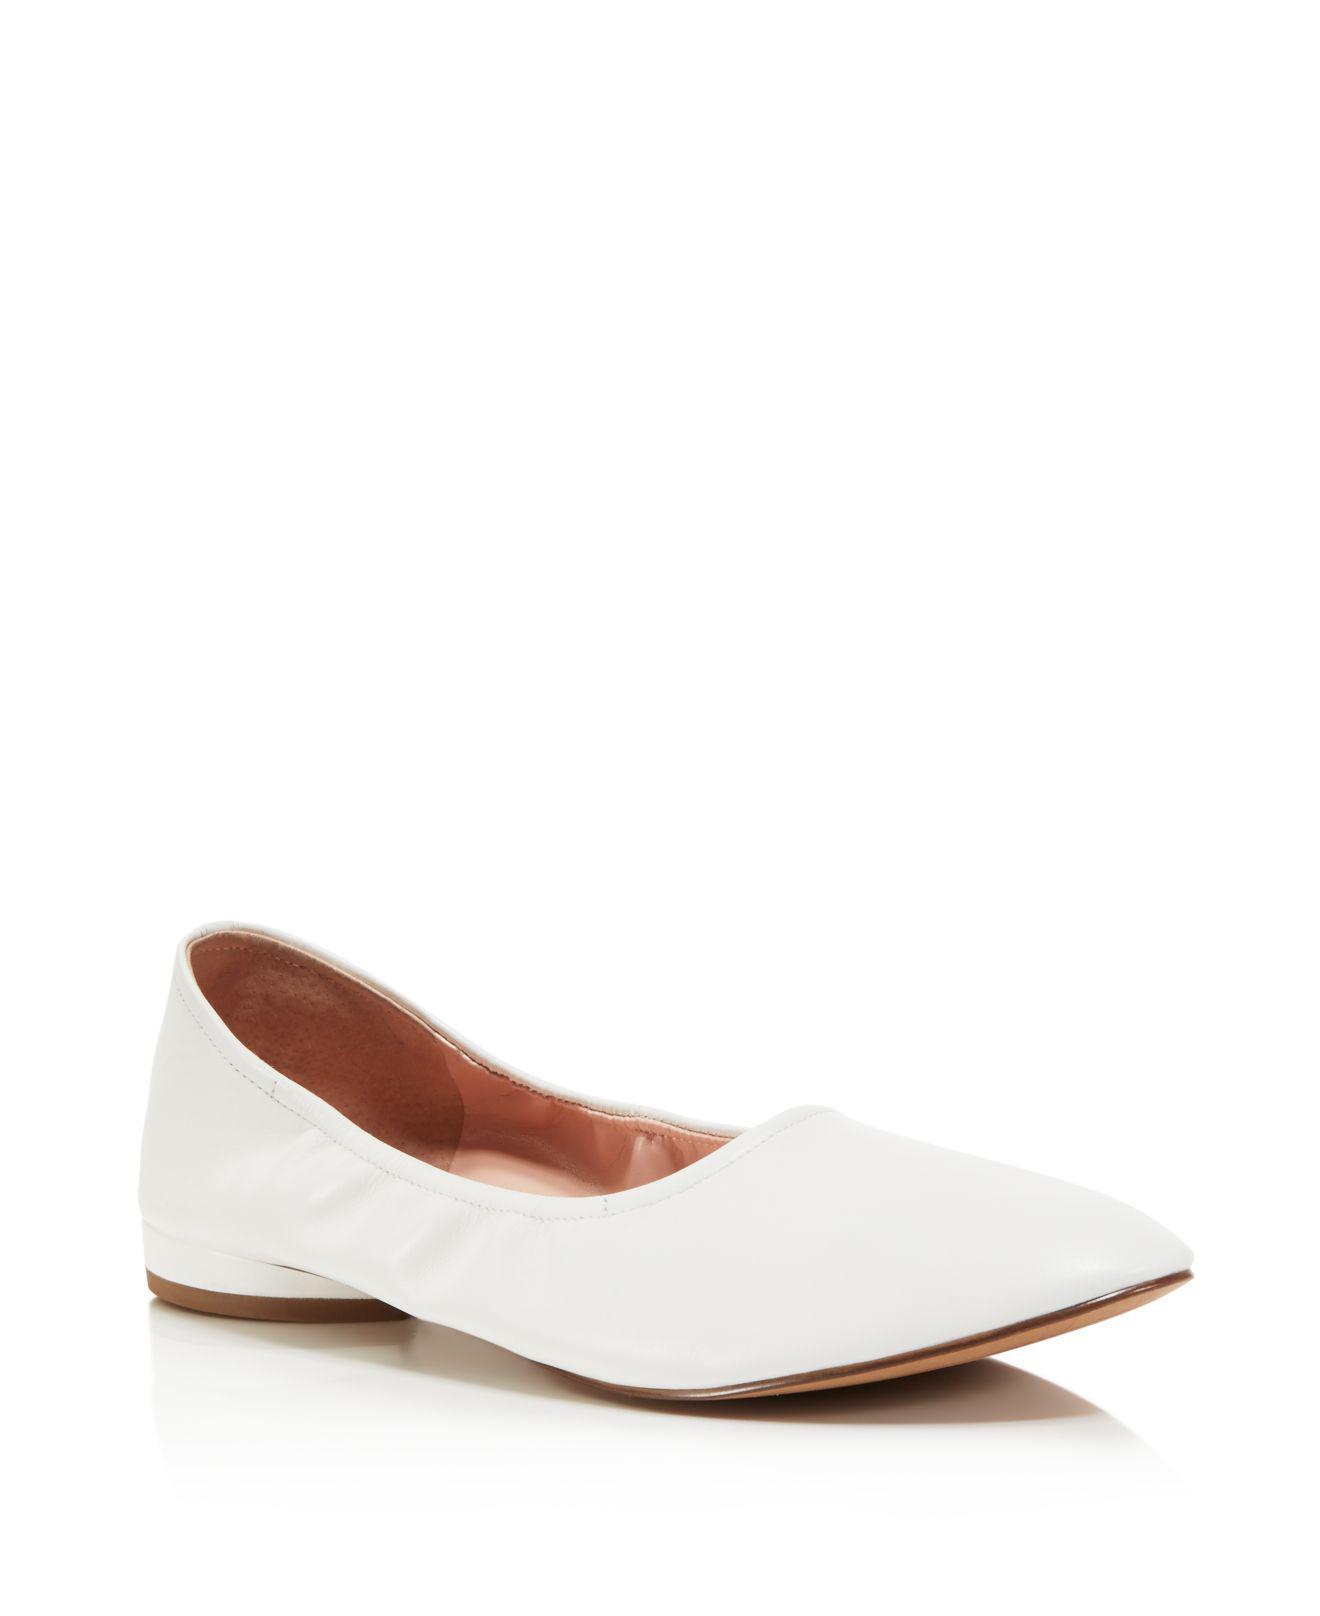 Shoes Of Prey Patent Ballent Flats